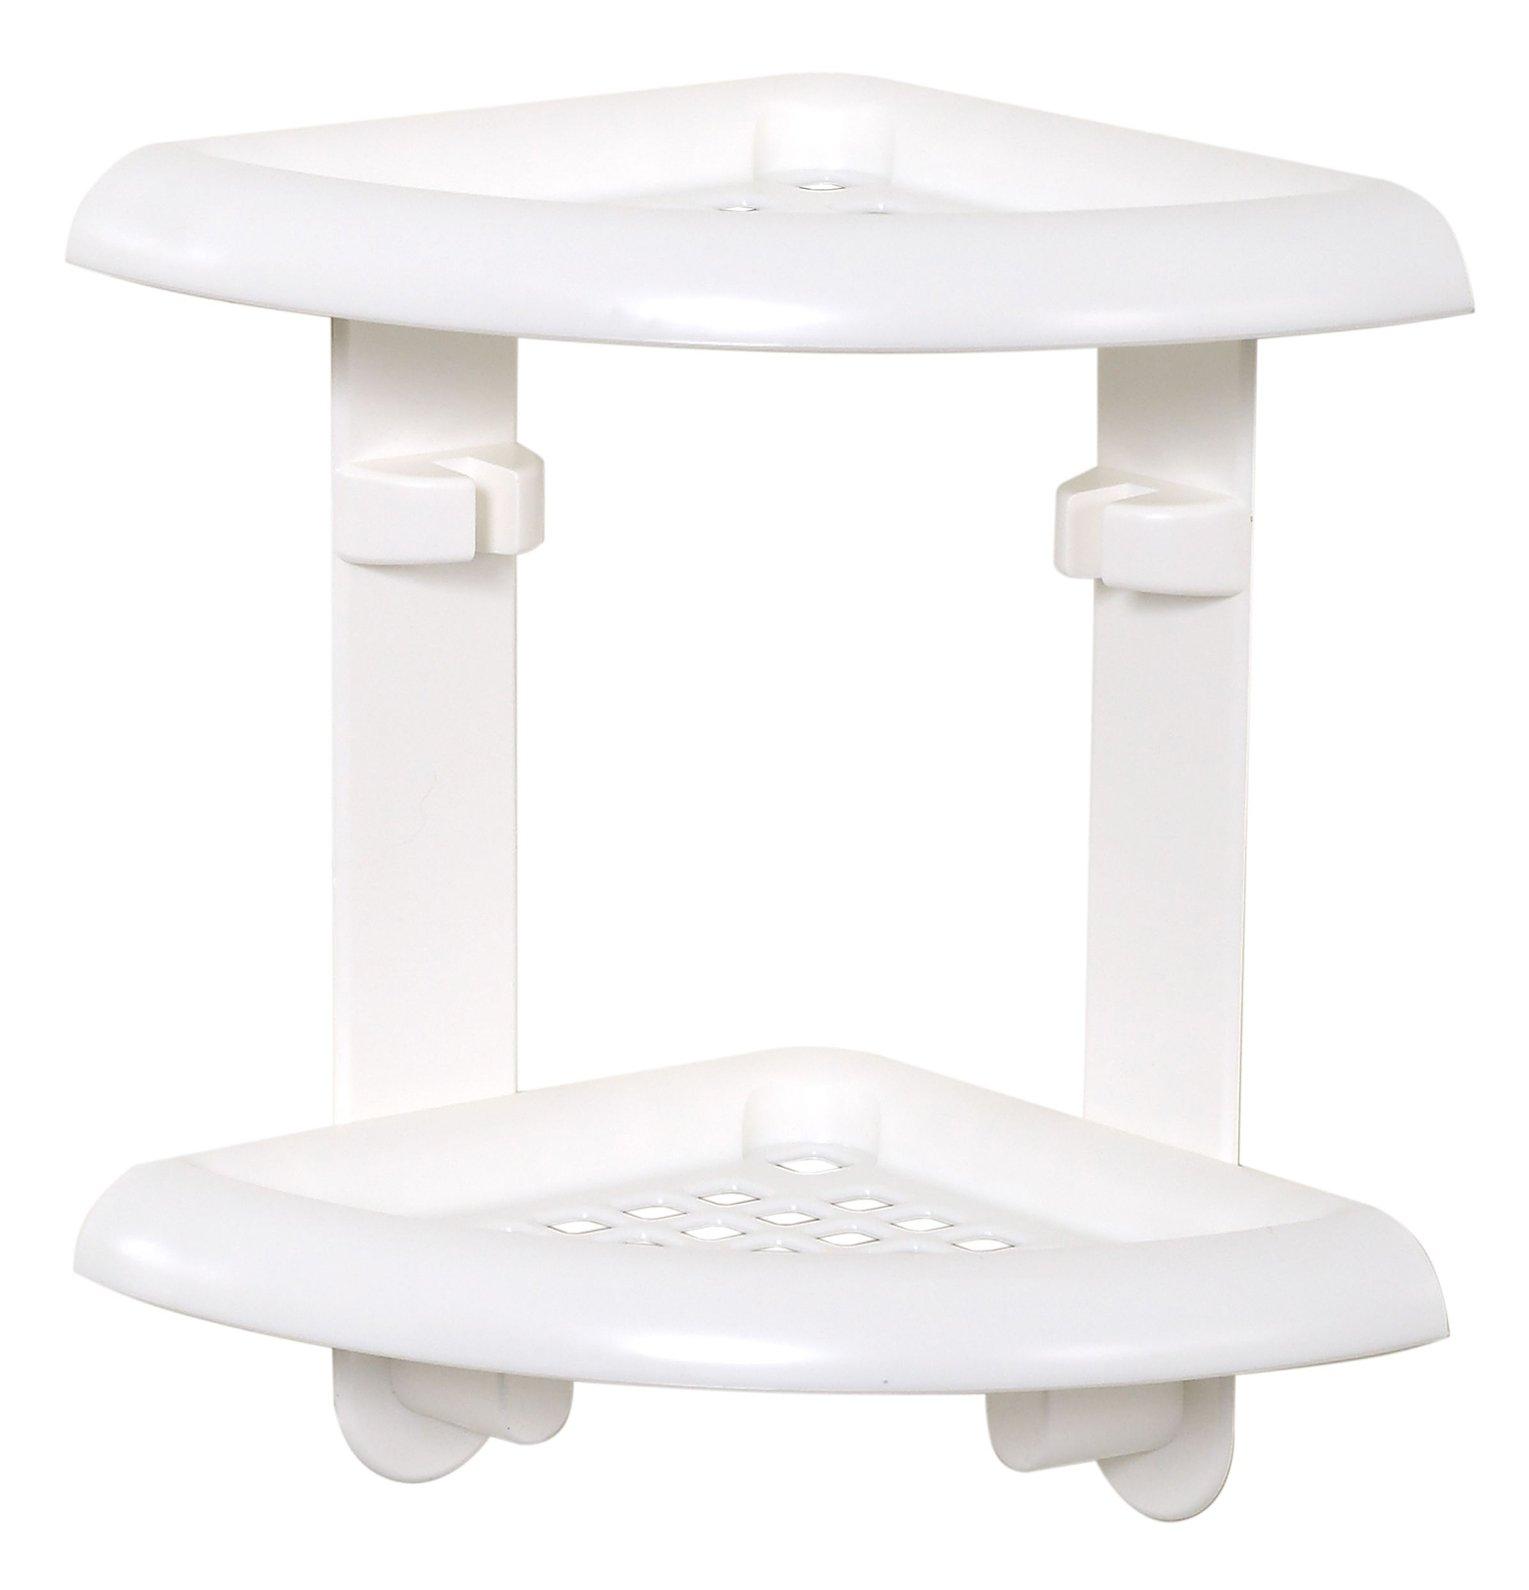 ZPC Zenith Products Corporation Zenna Home 370W, Bath and Shower Corner Caddy, White